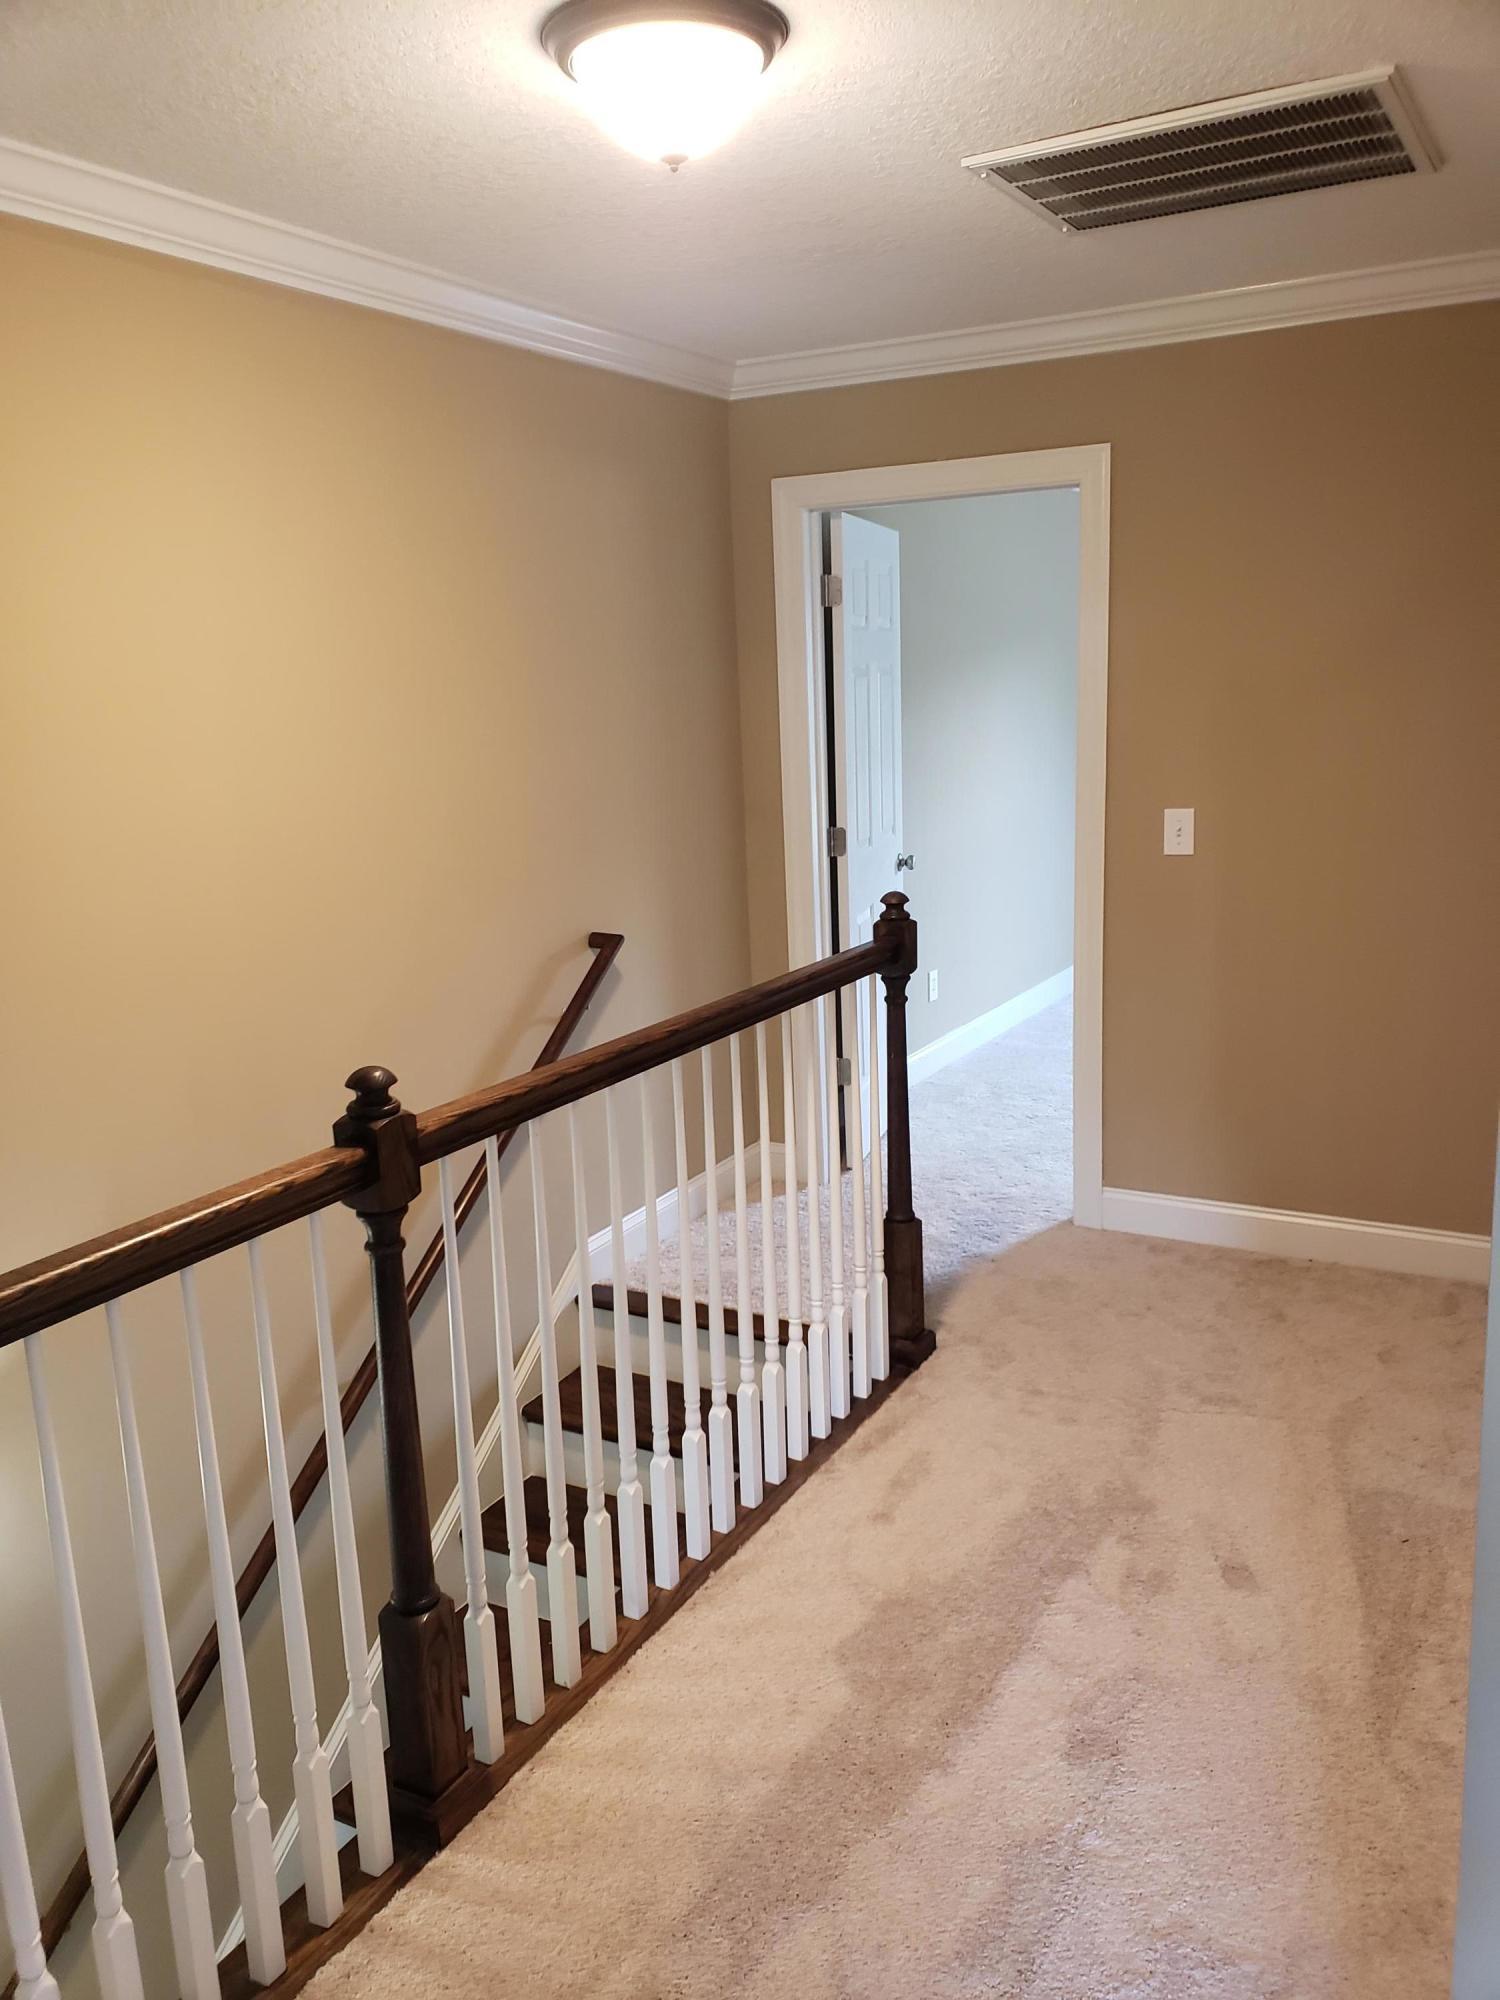 Montague Pointe Homes For Sale - 100 Gavins, Goose Creek, SC - 1